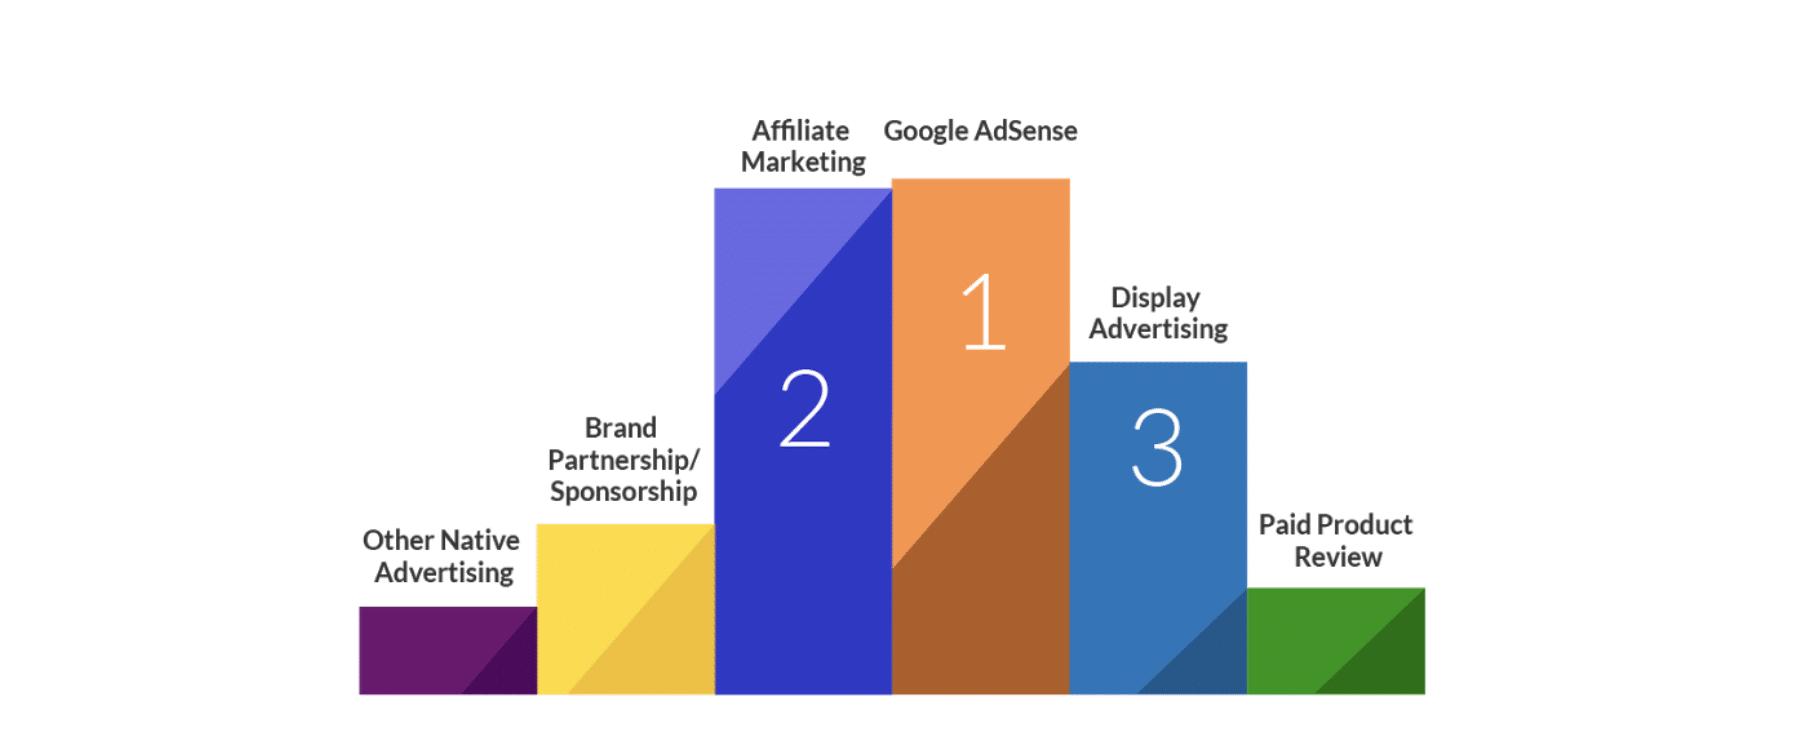 bar graph listing affiliate marketing and adsense as top revenue sources